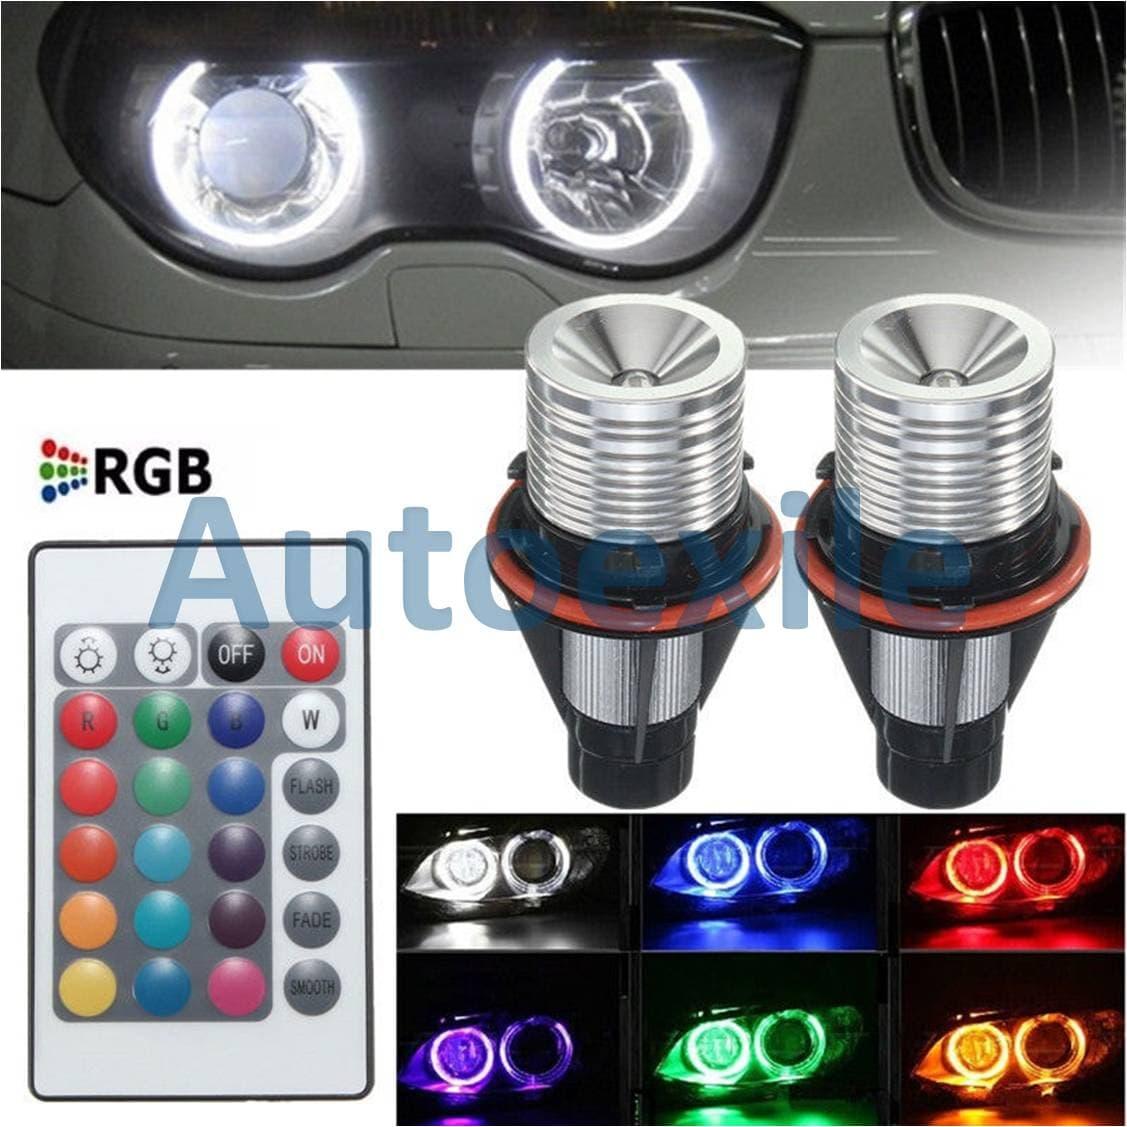 Angel Eyes LED RGB Putih Lampu Bimmer Warna Warni Mobil BMW E39 E53 E60 E61 E63 E64 E65 E66 E83 E87 X3 X5